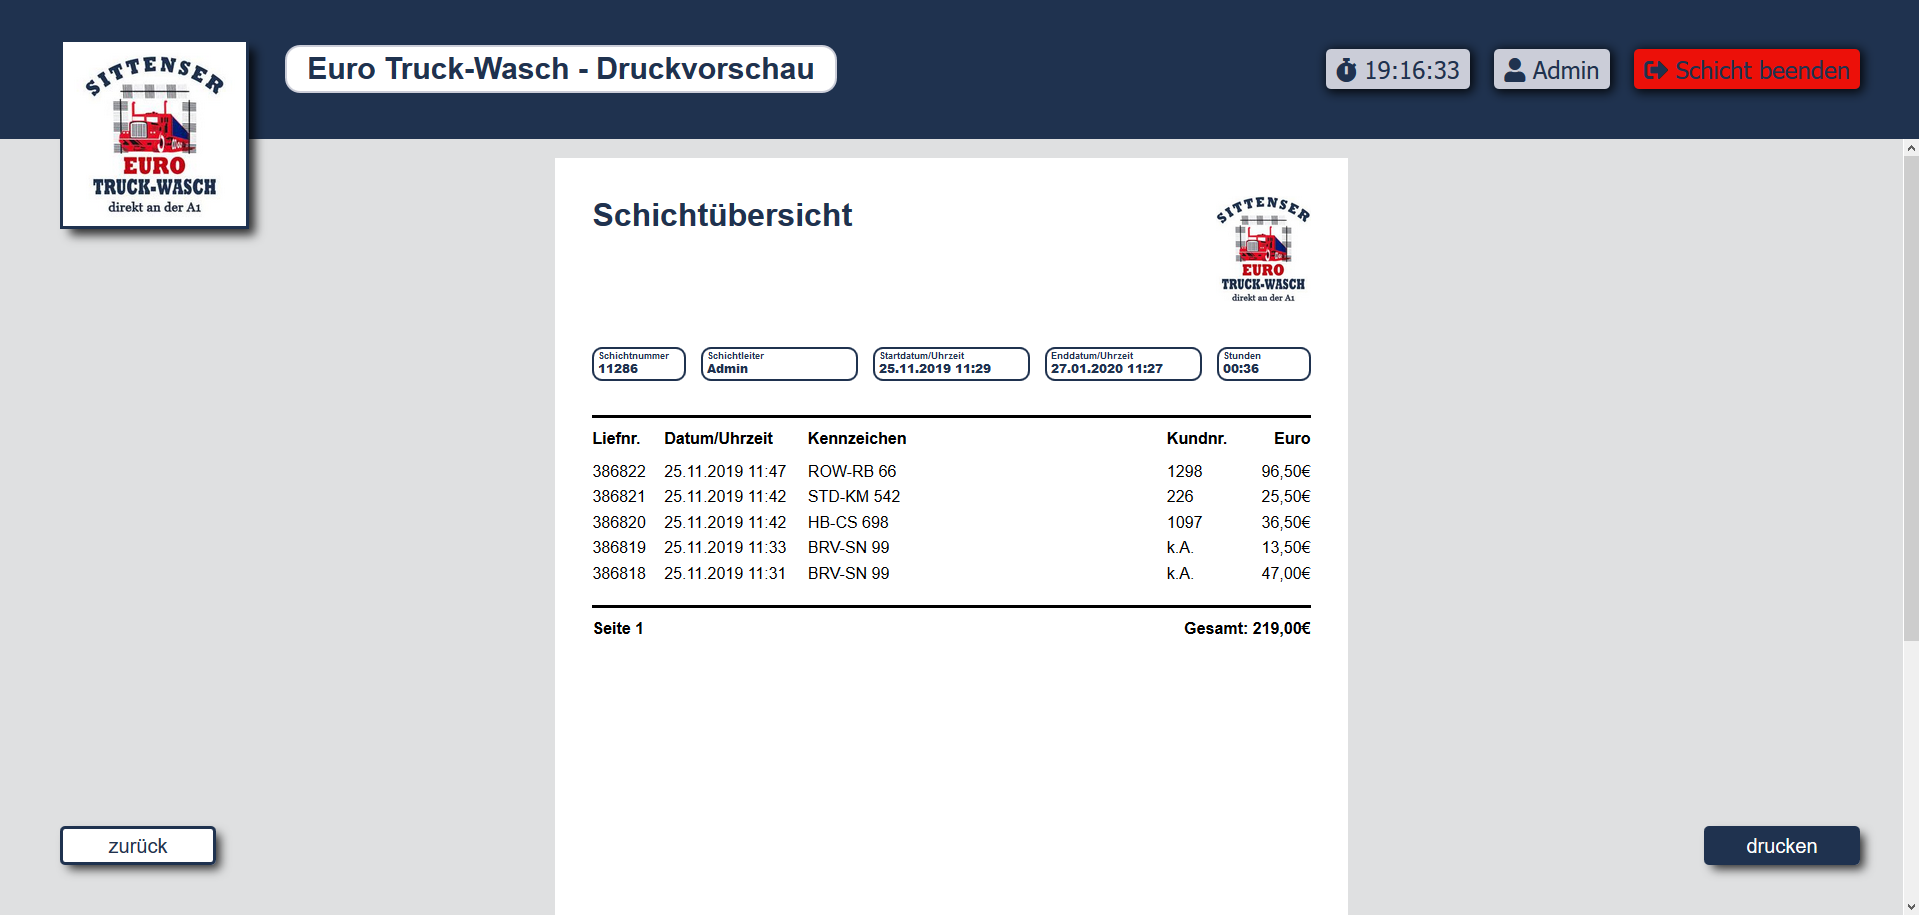 Eurotruckwasch-Waschannahme-04